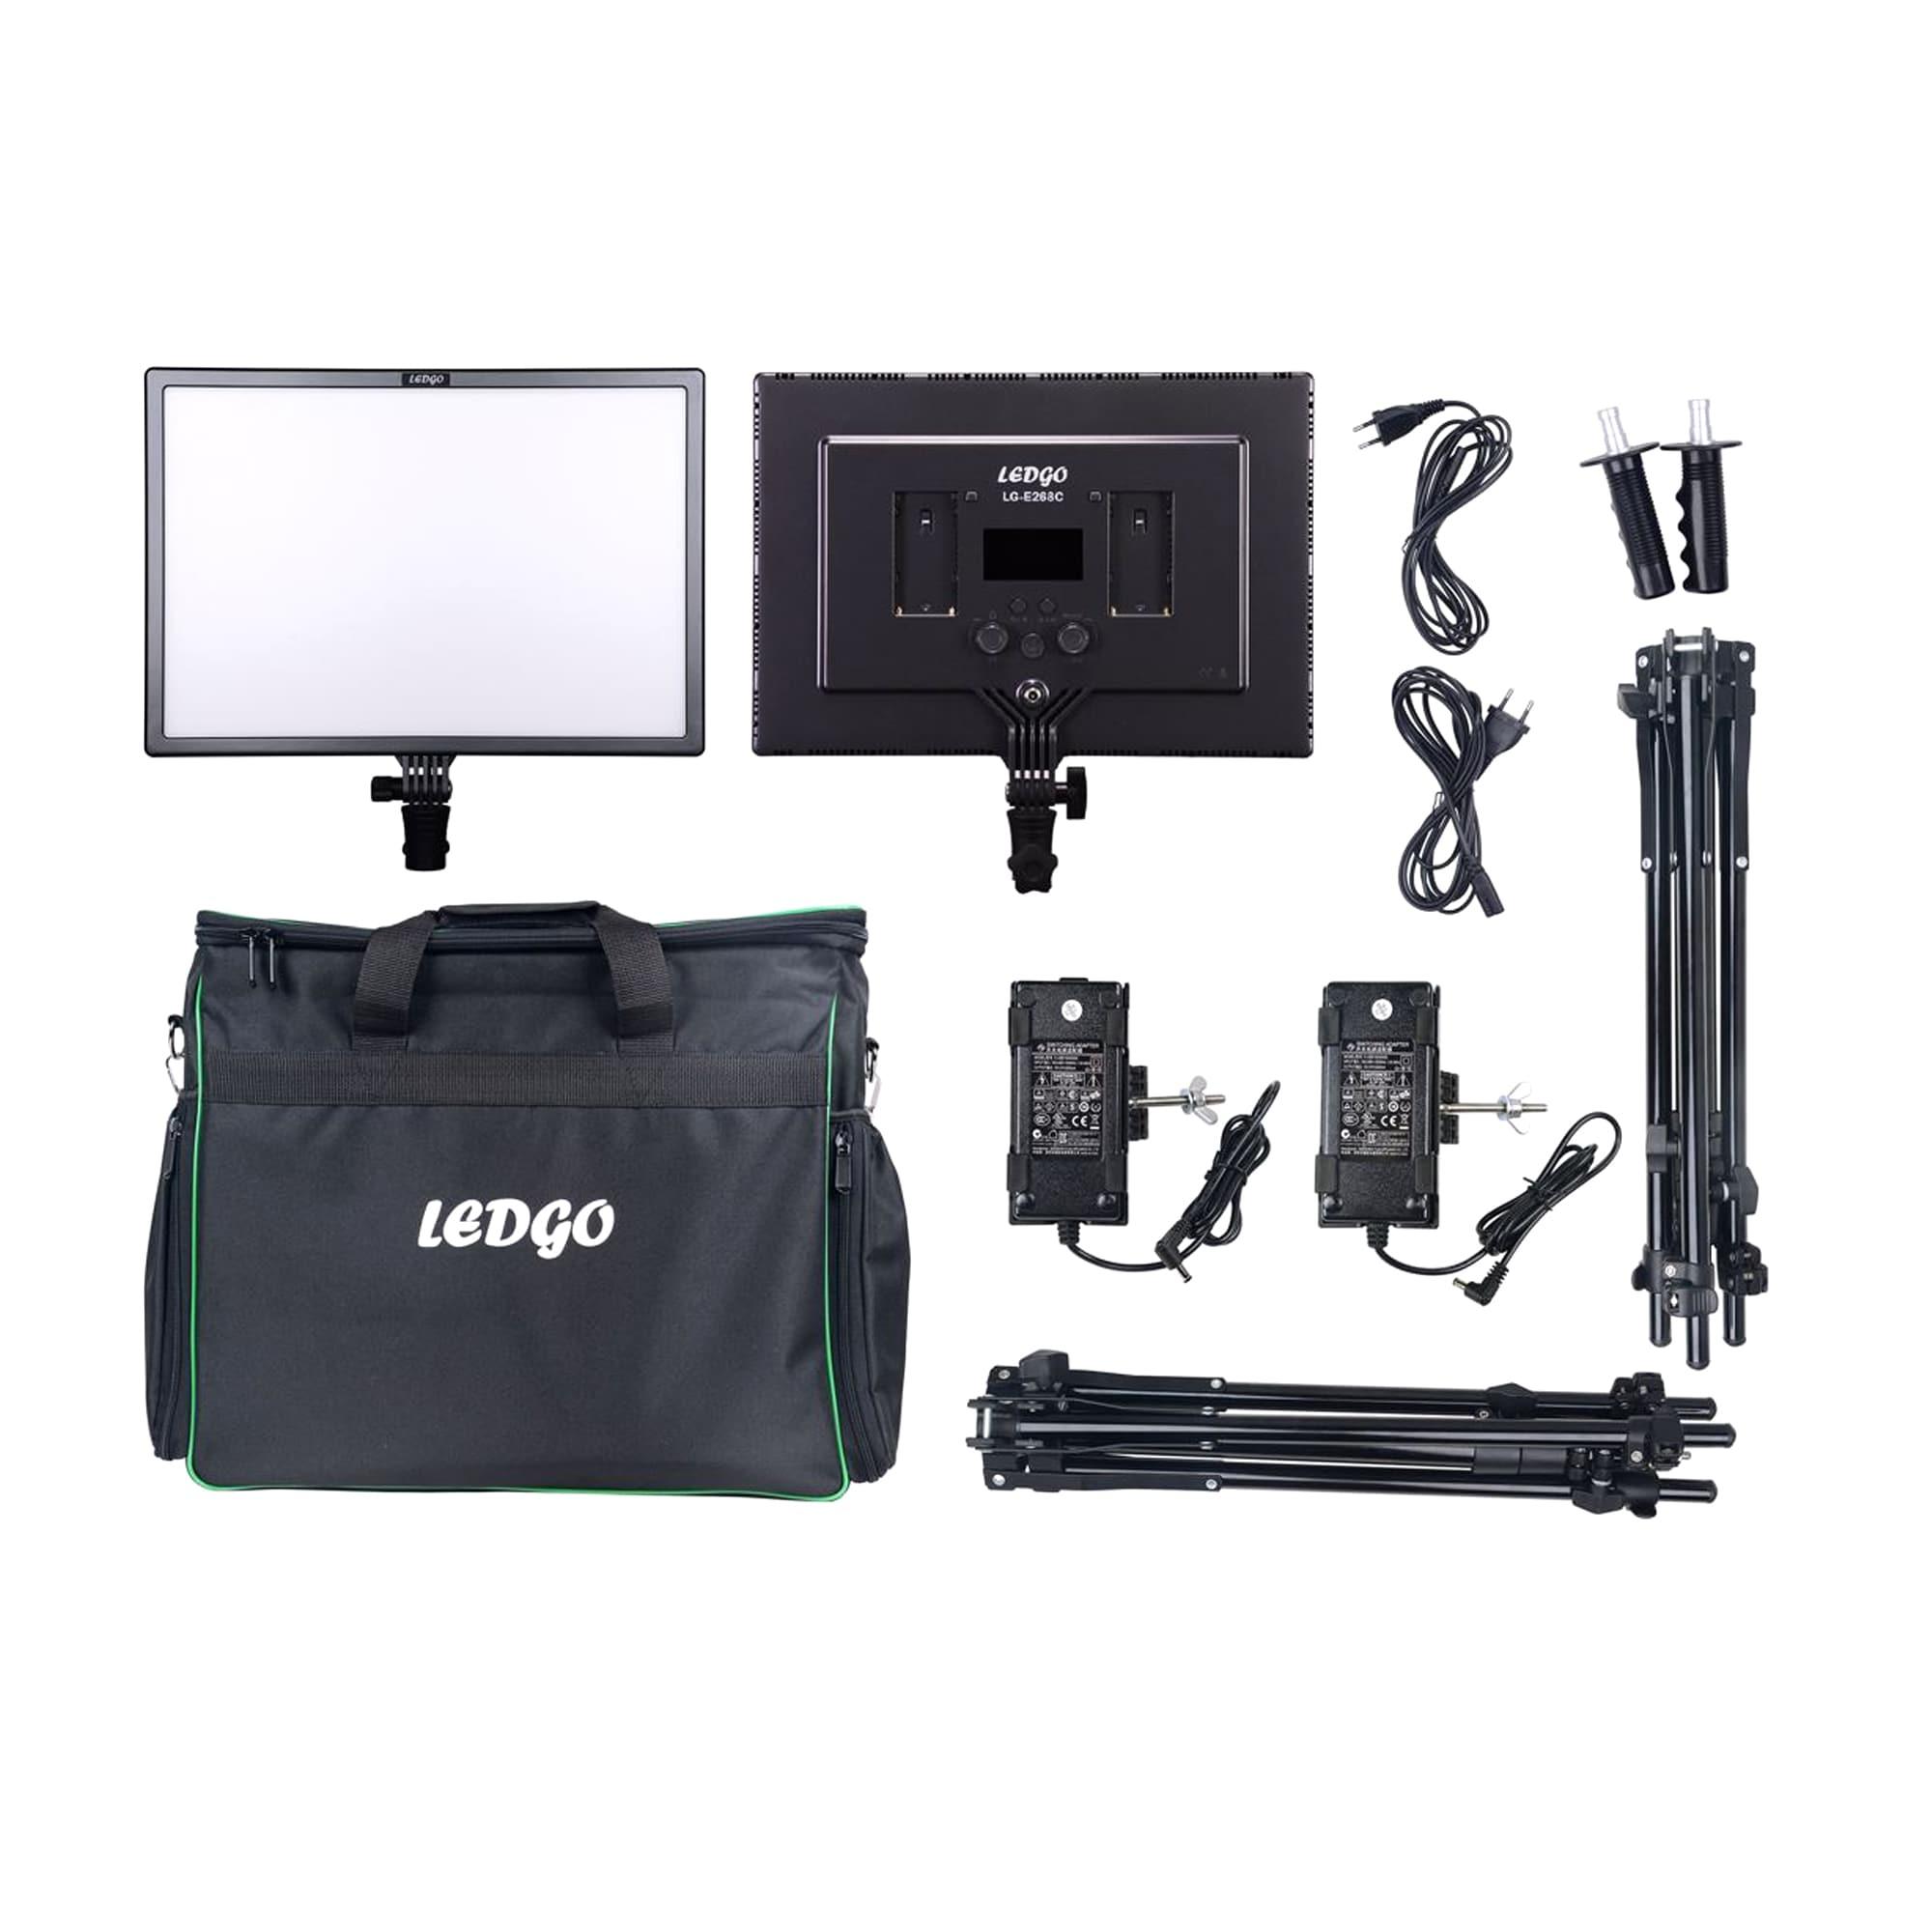 Ledgo LG-E268C paket med 2 lampor, stativ